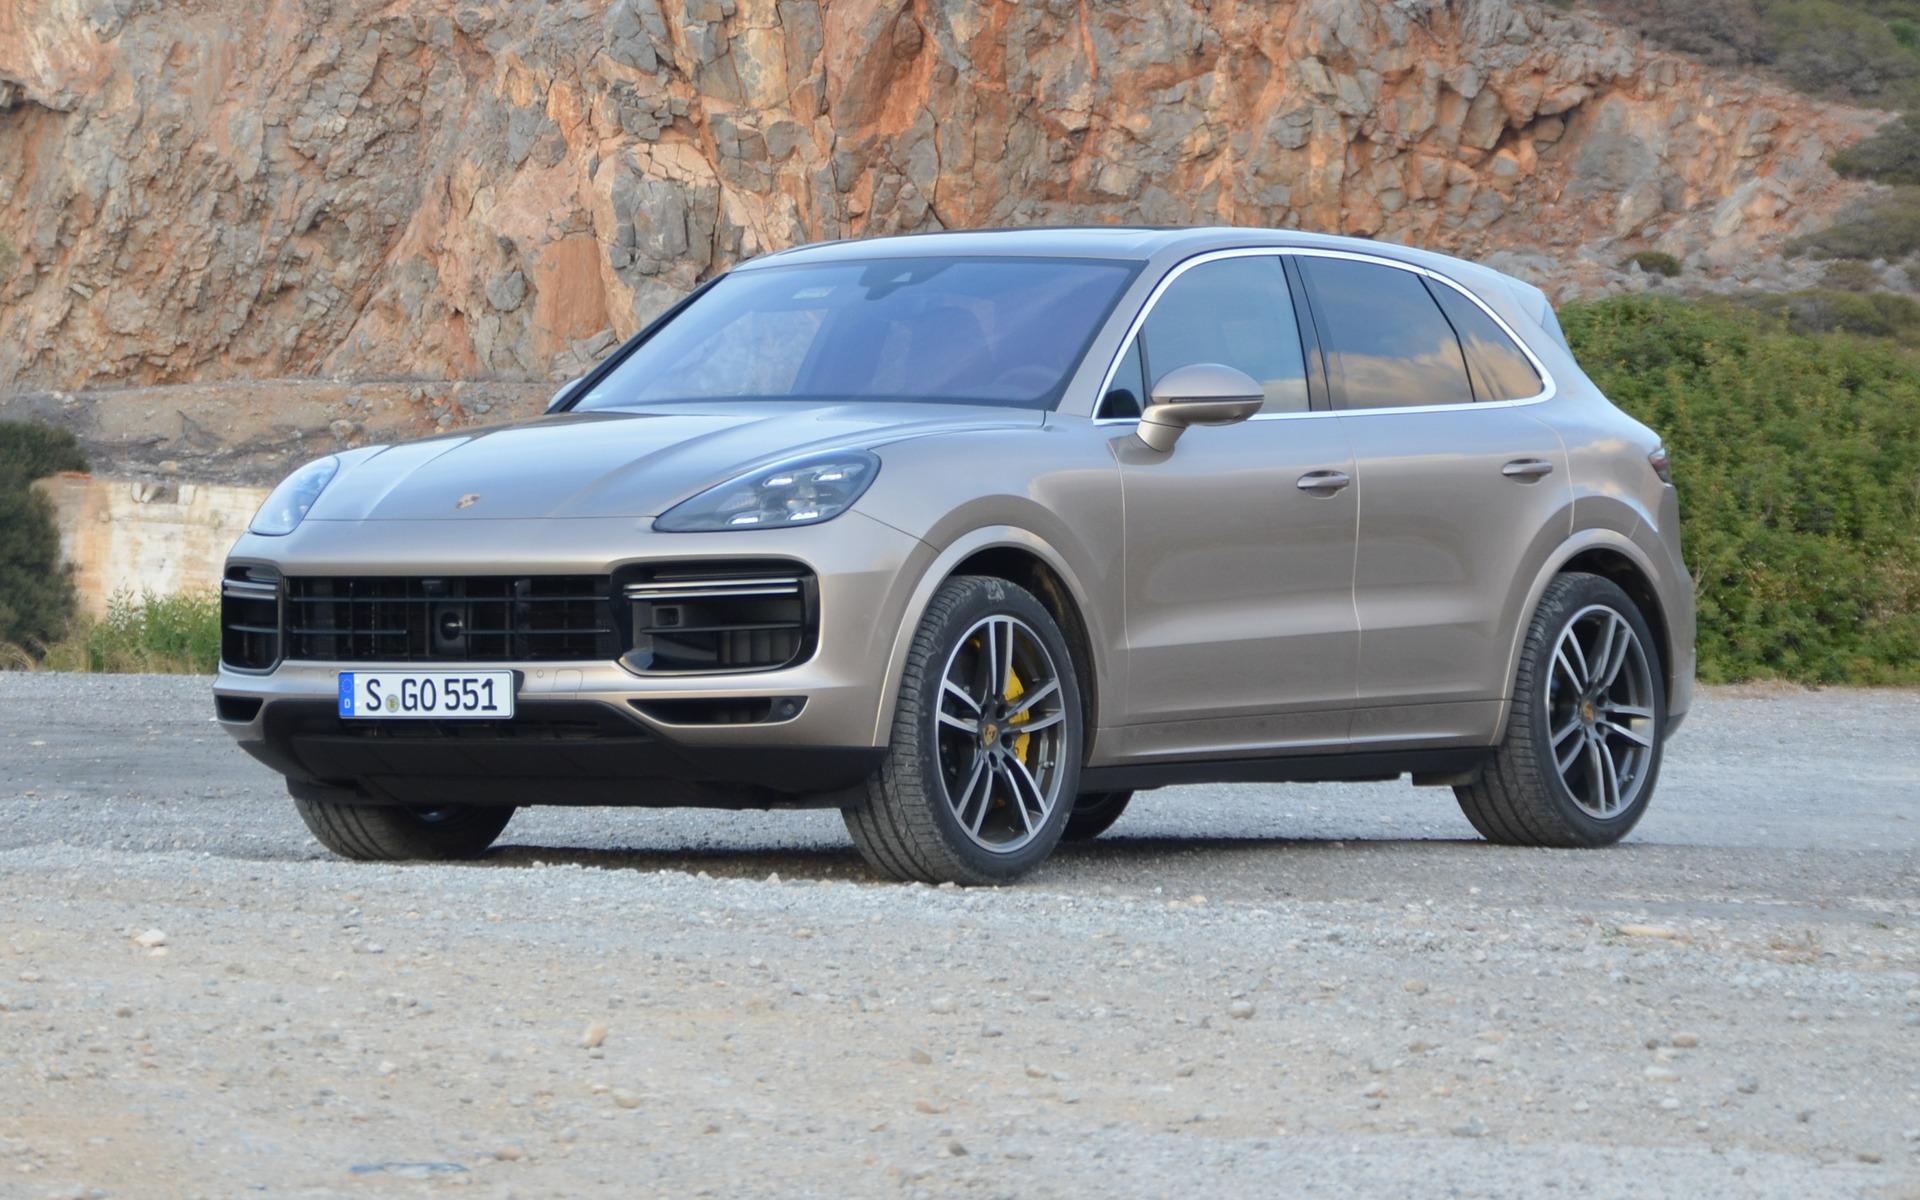 2019 Porsche Line-up Looks Impressive, Android Auto Coming